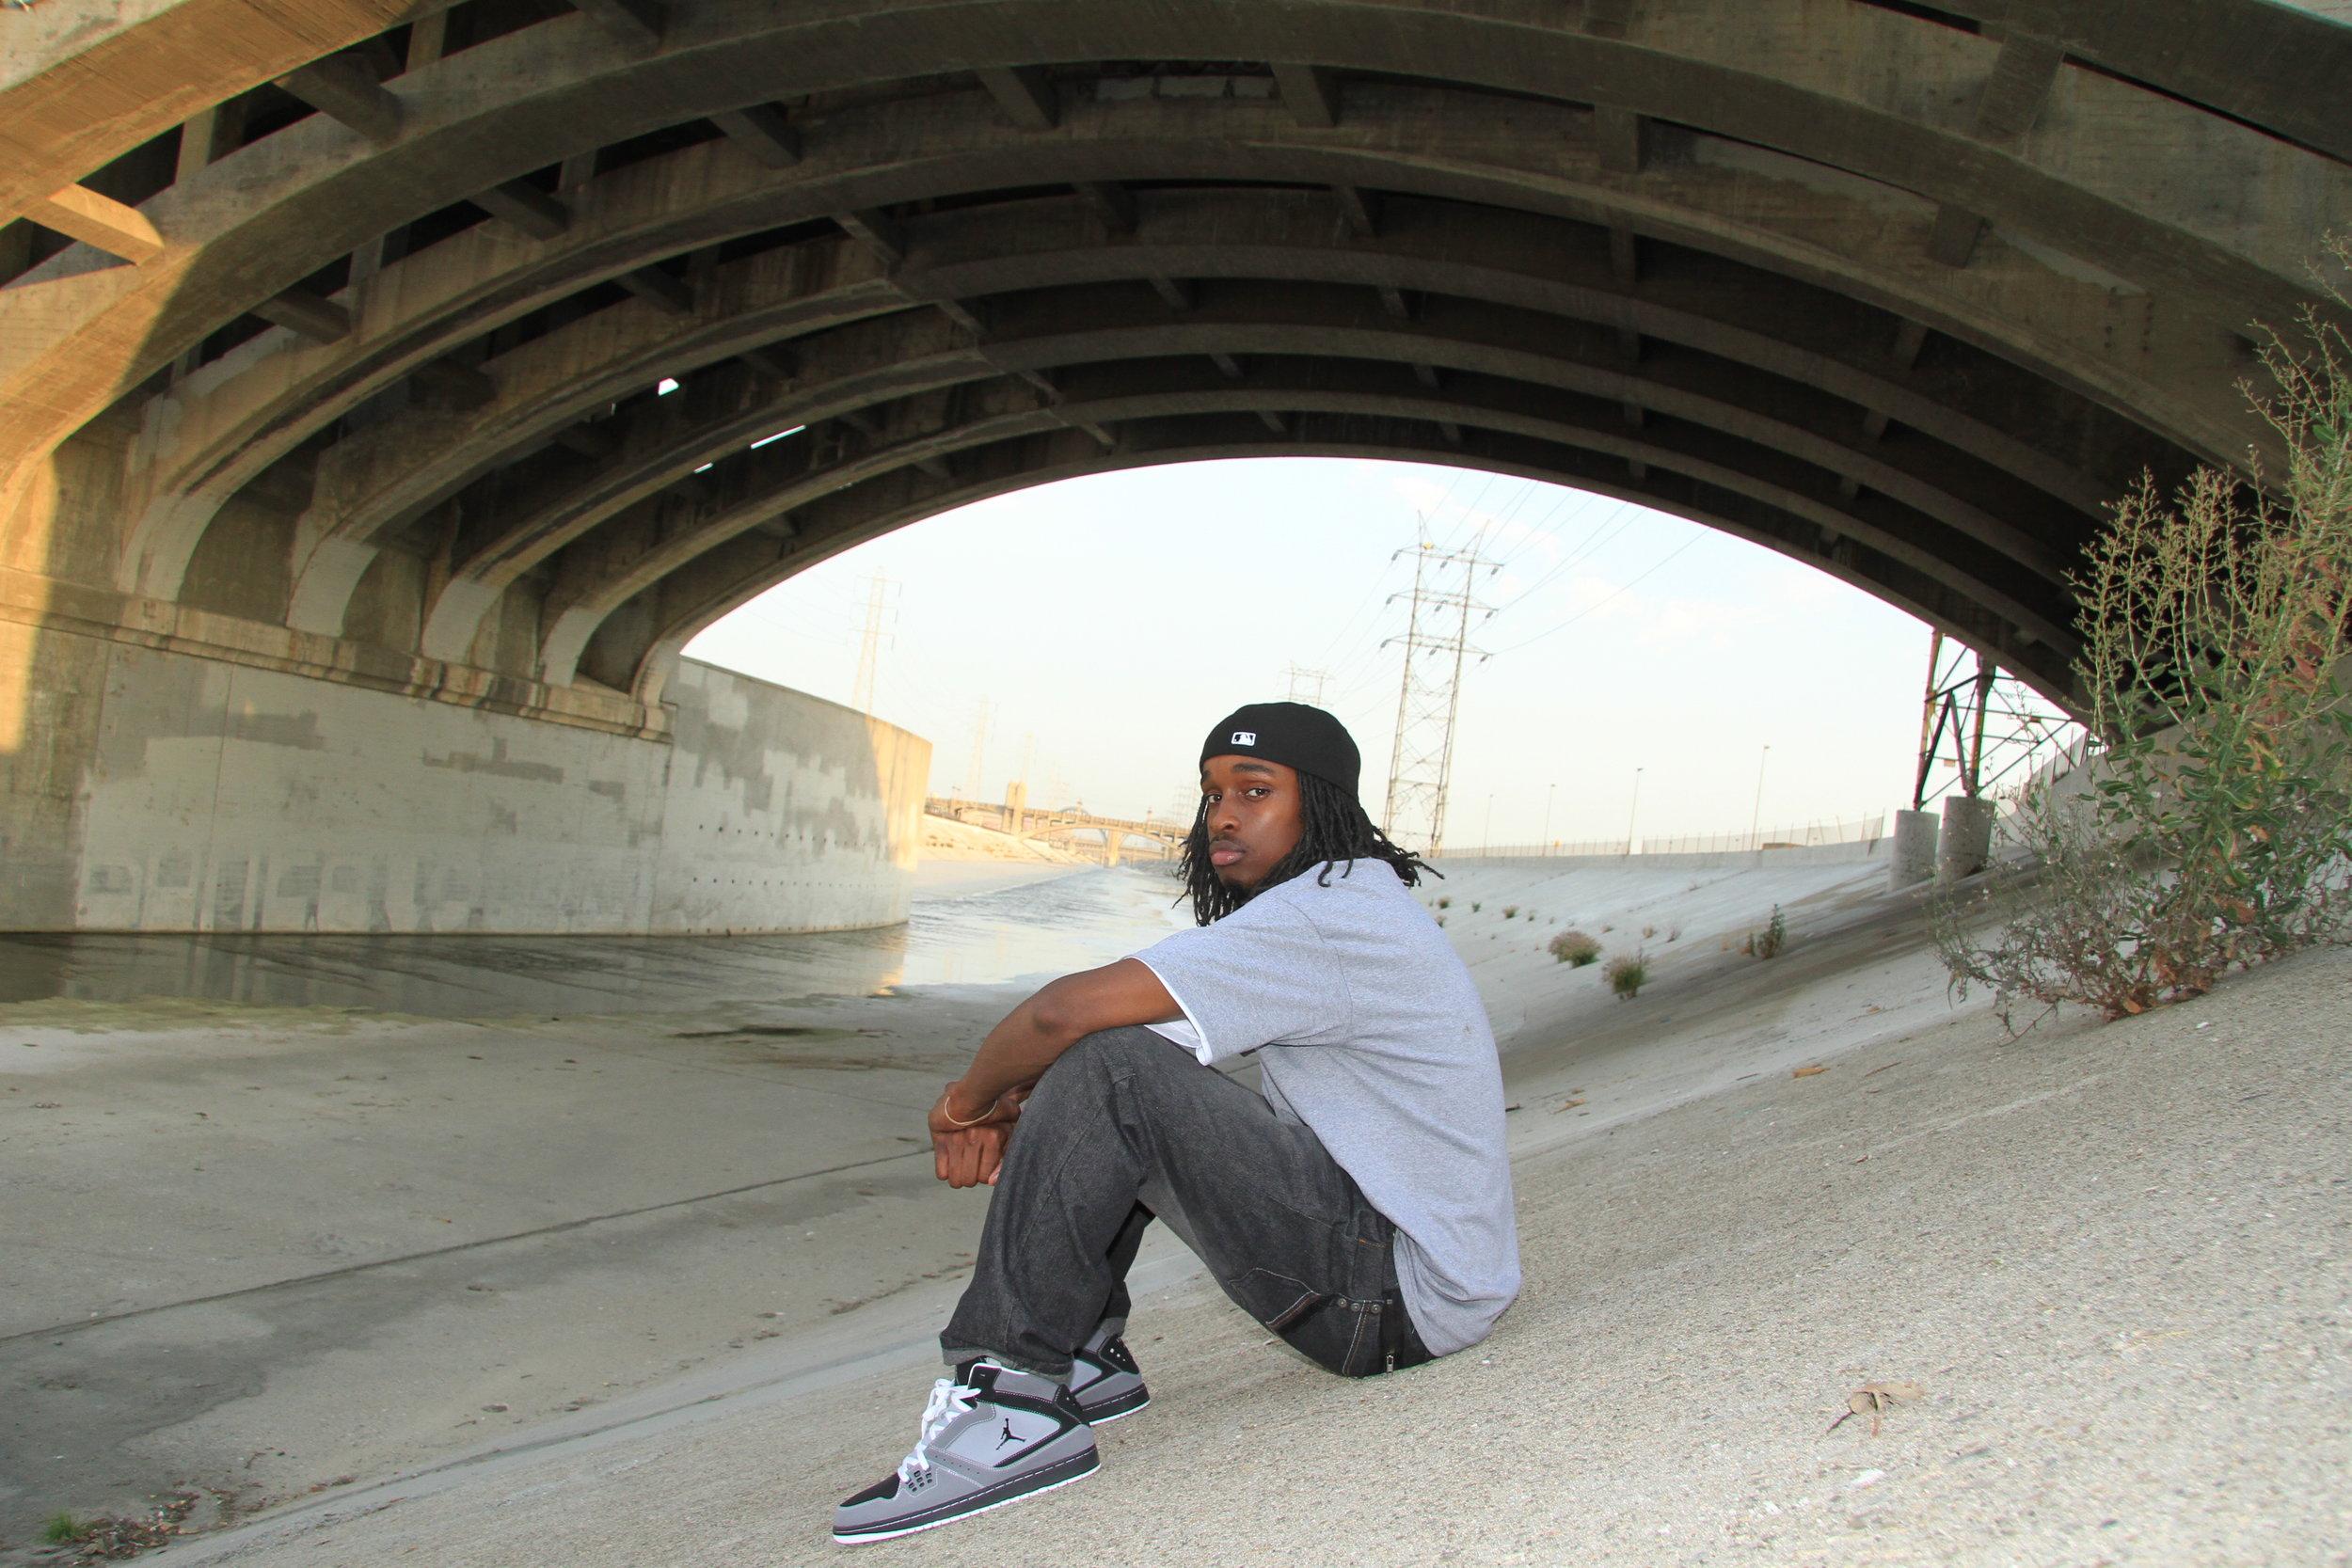 Musician posing shit sitting under the 1st street bridge